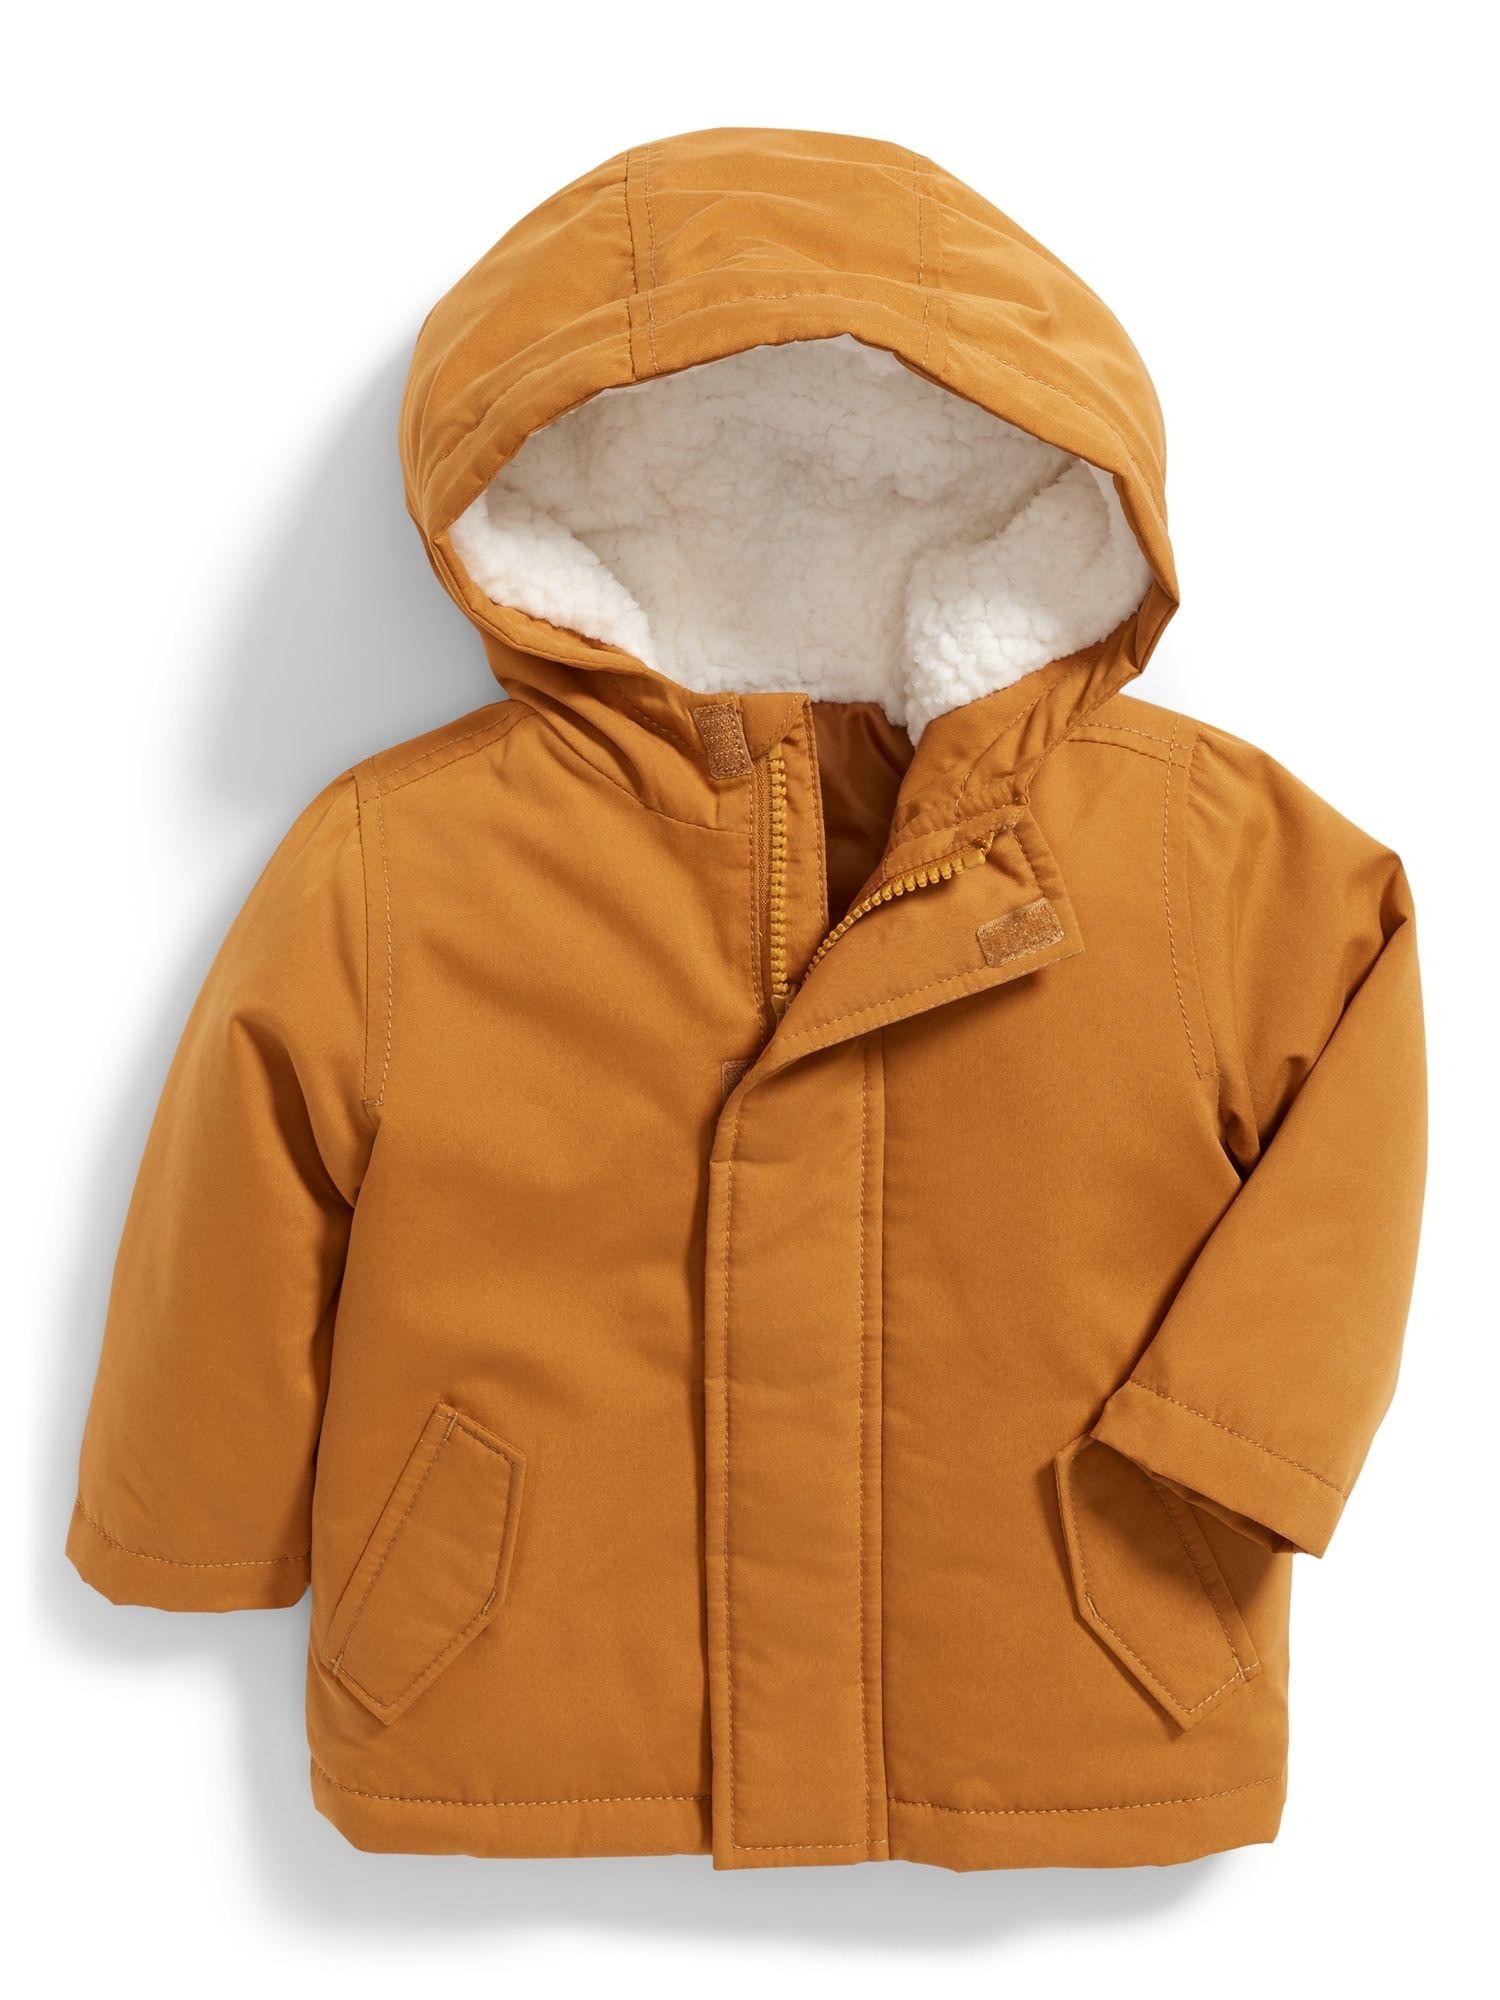 Hooded Parka For Baby Baby Boy Jackets Boy Outerwear Boys Jacket [ 2000 x 1500 Pixel ]